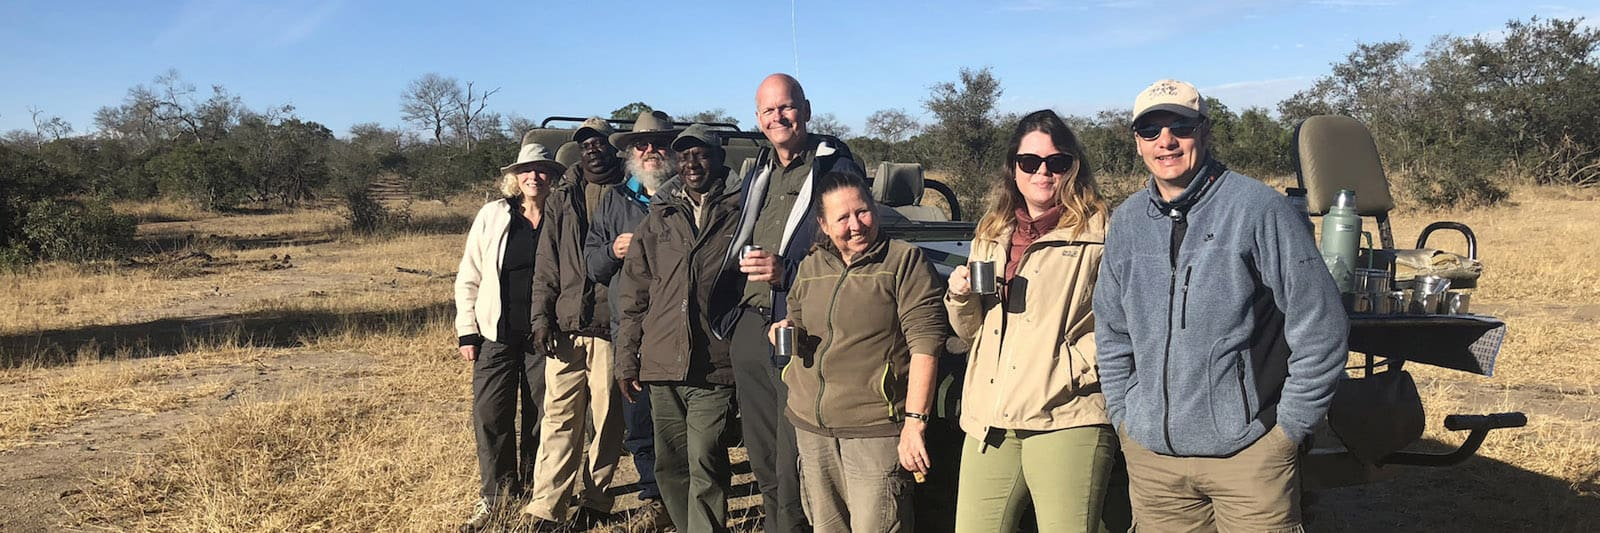 Photo Safari South Africa: A Personal Account